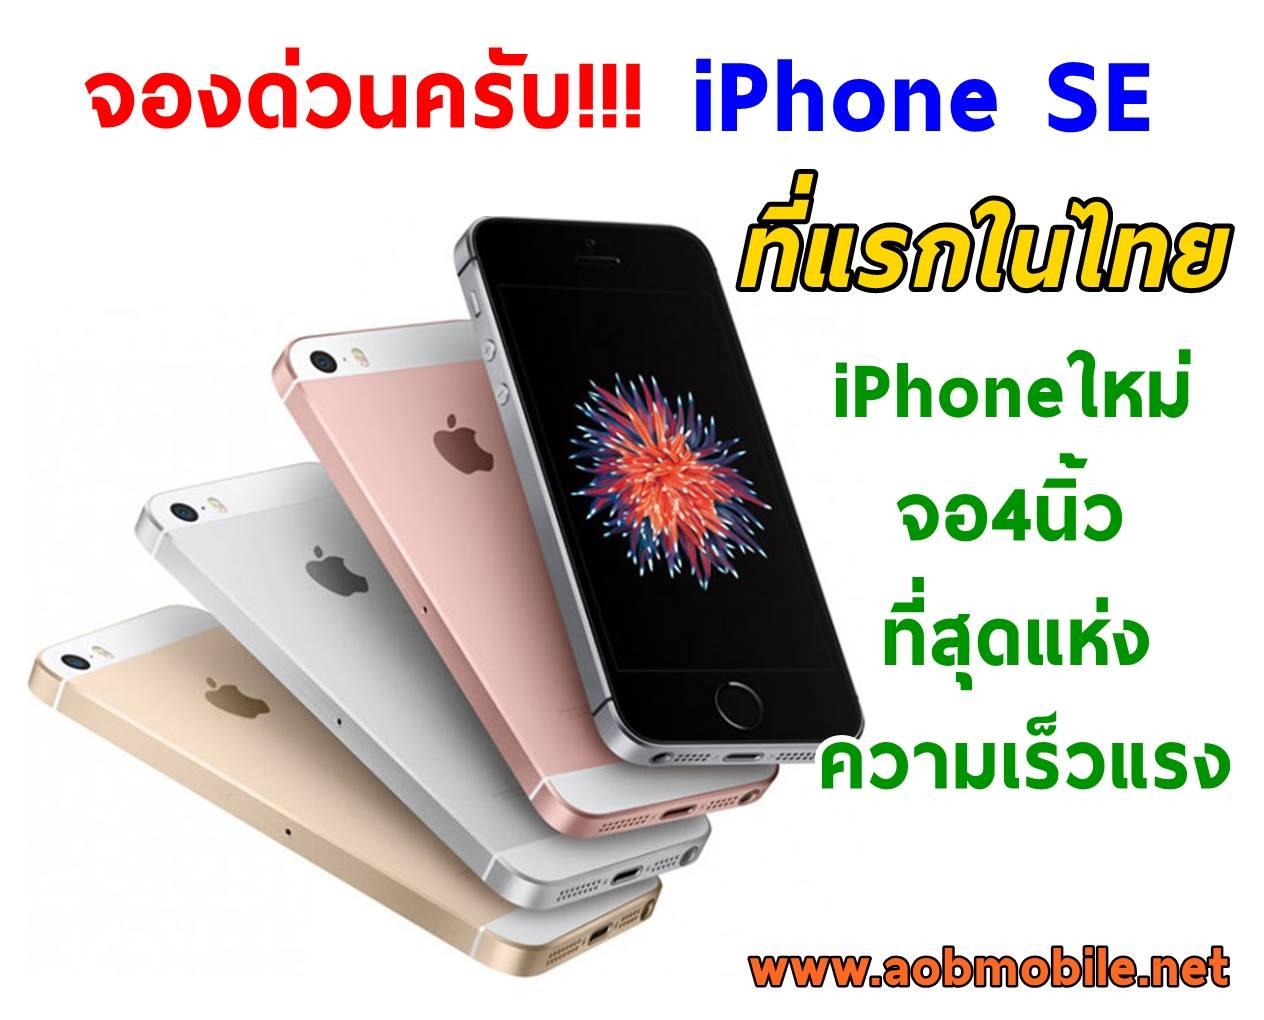 12901442_1140917665941266_3655347960494301520_o